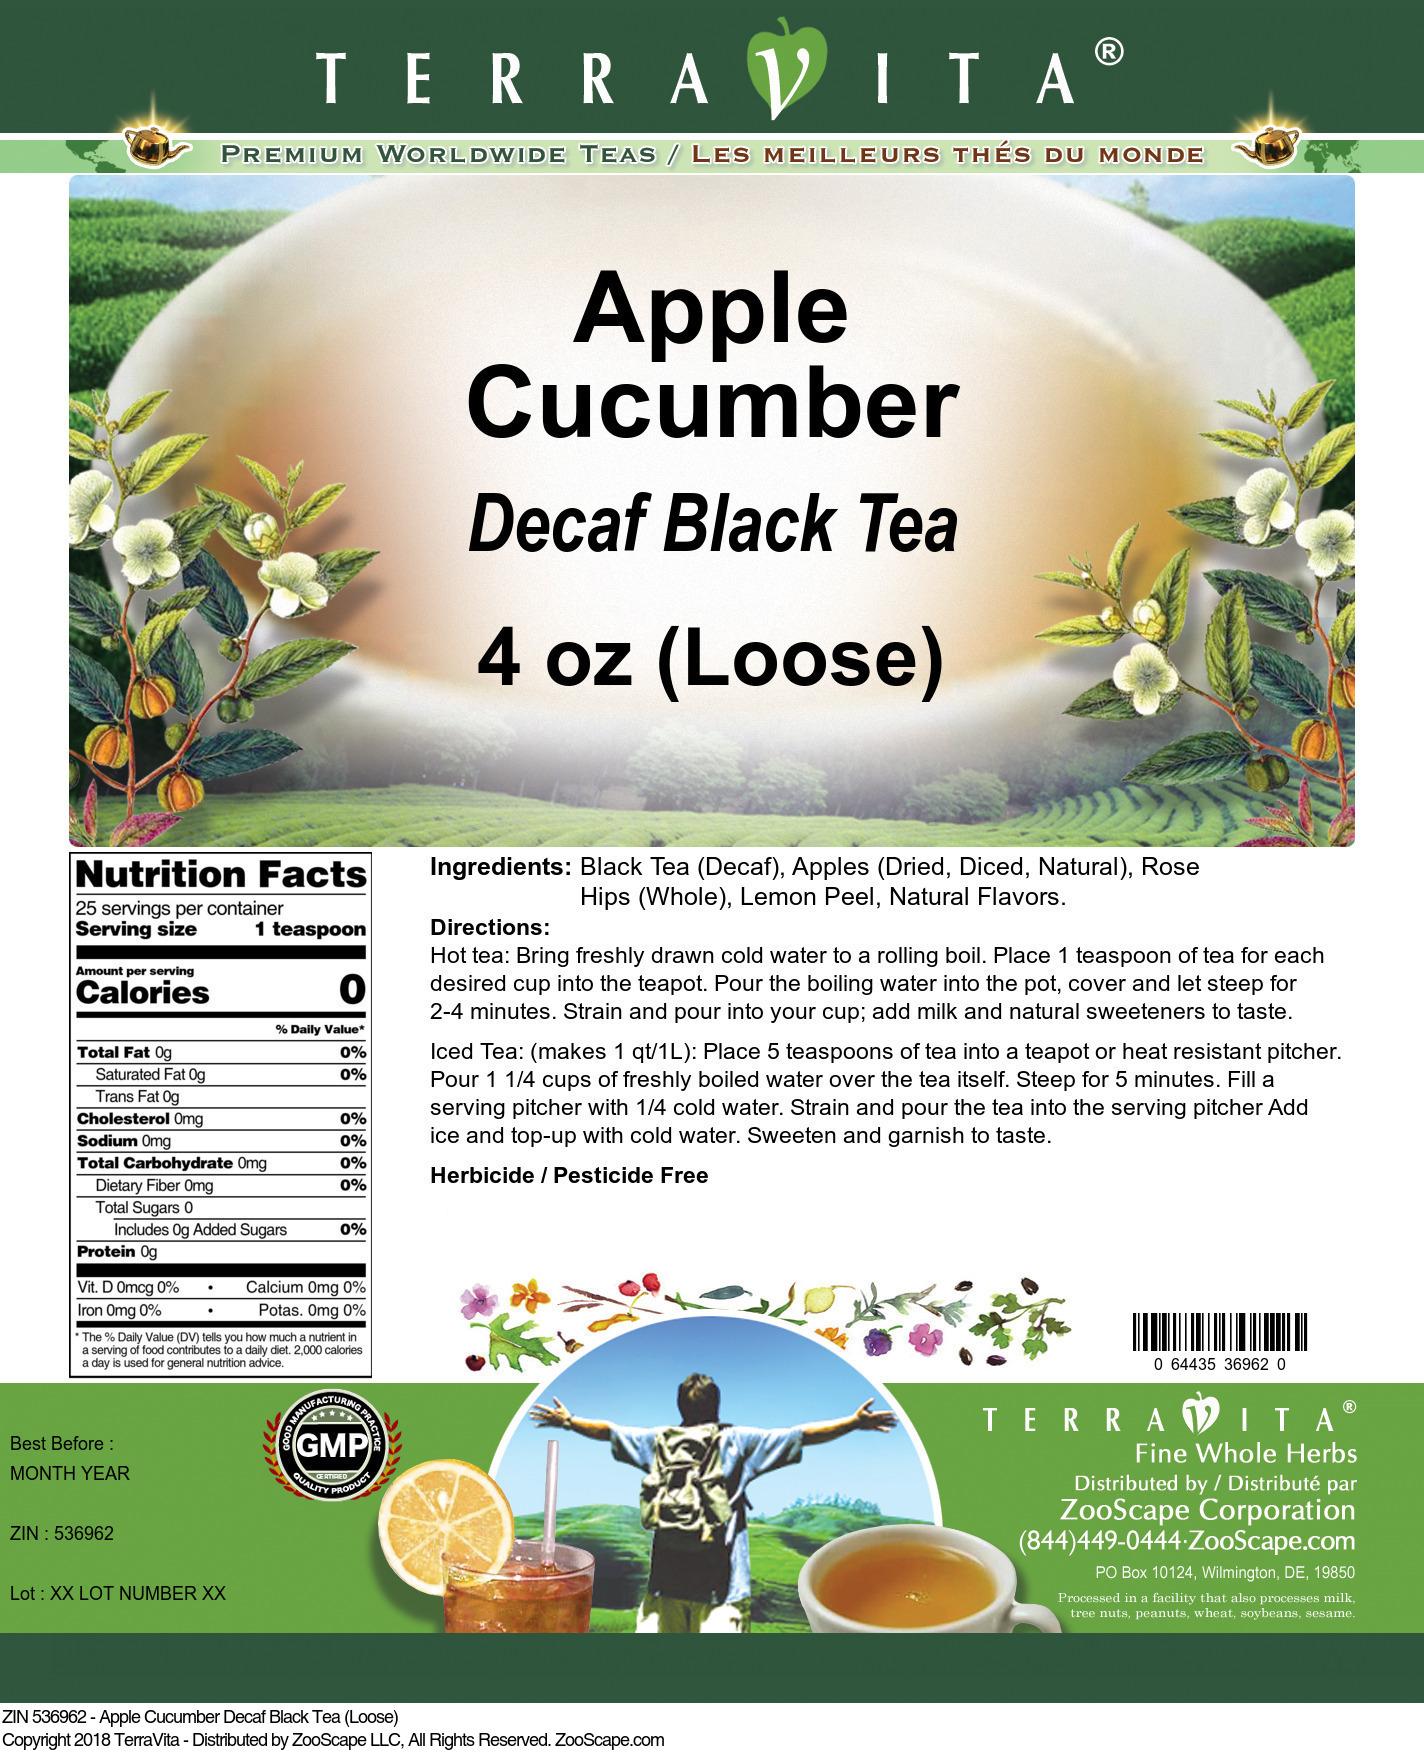 Apple Cucumber Decaf Black Tea